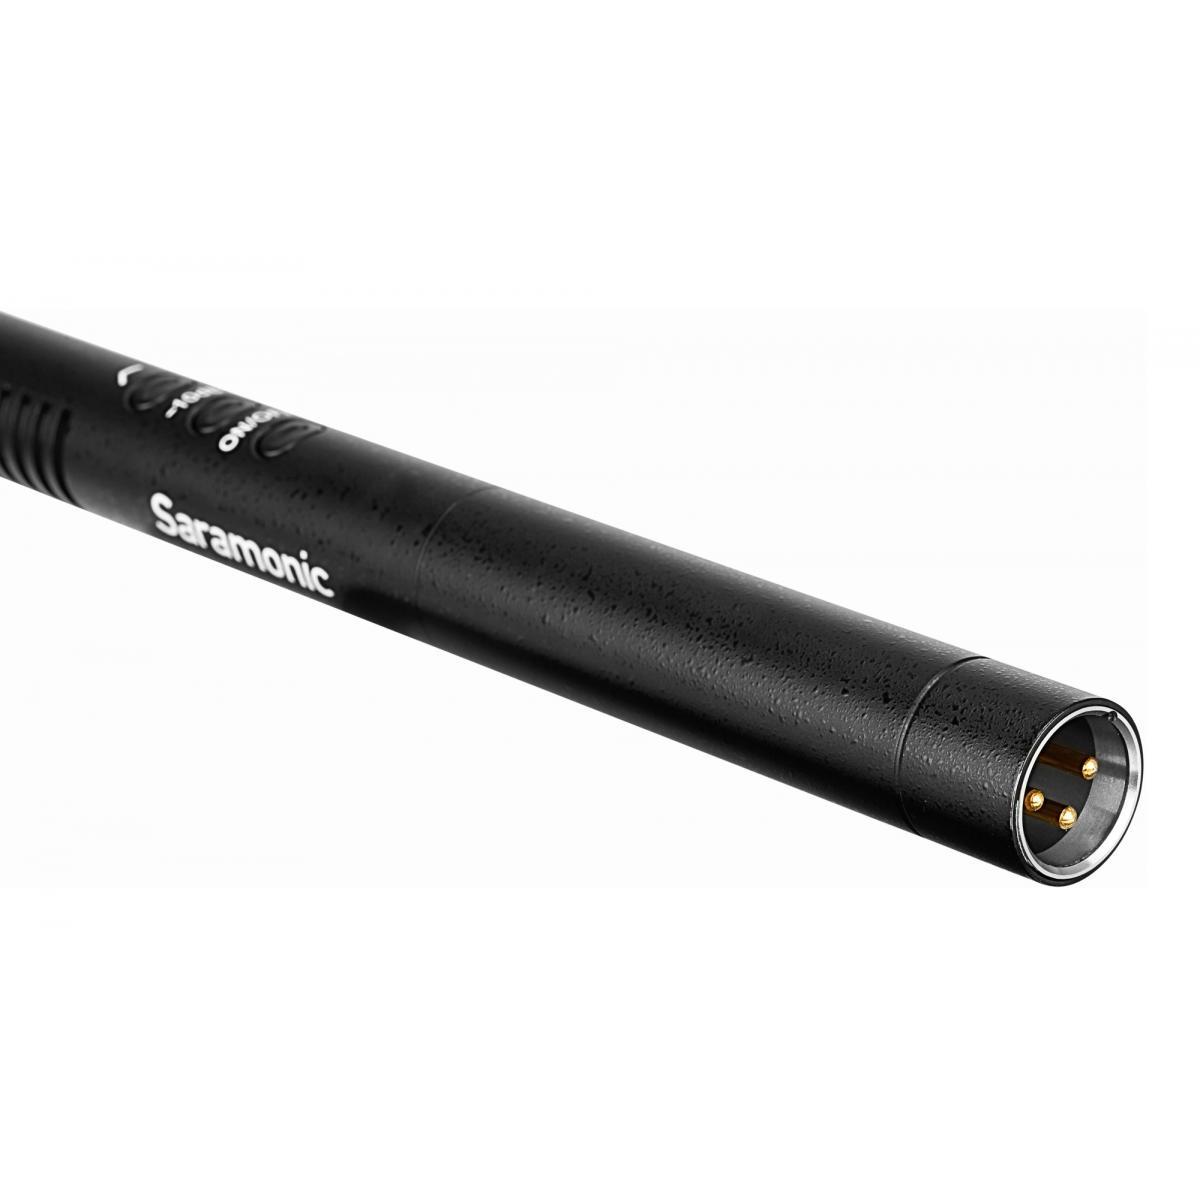 Saramonic SoundBird V1 capacitive microphone with XLR connector